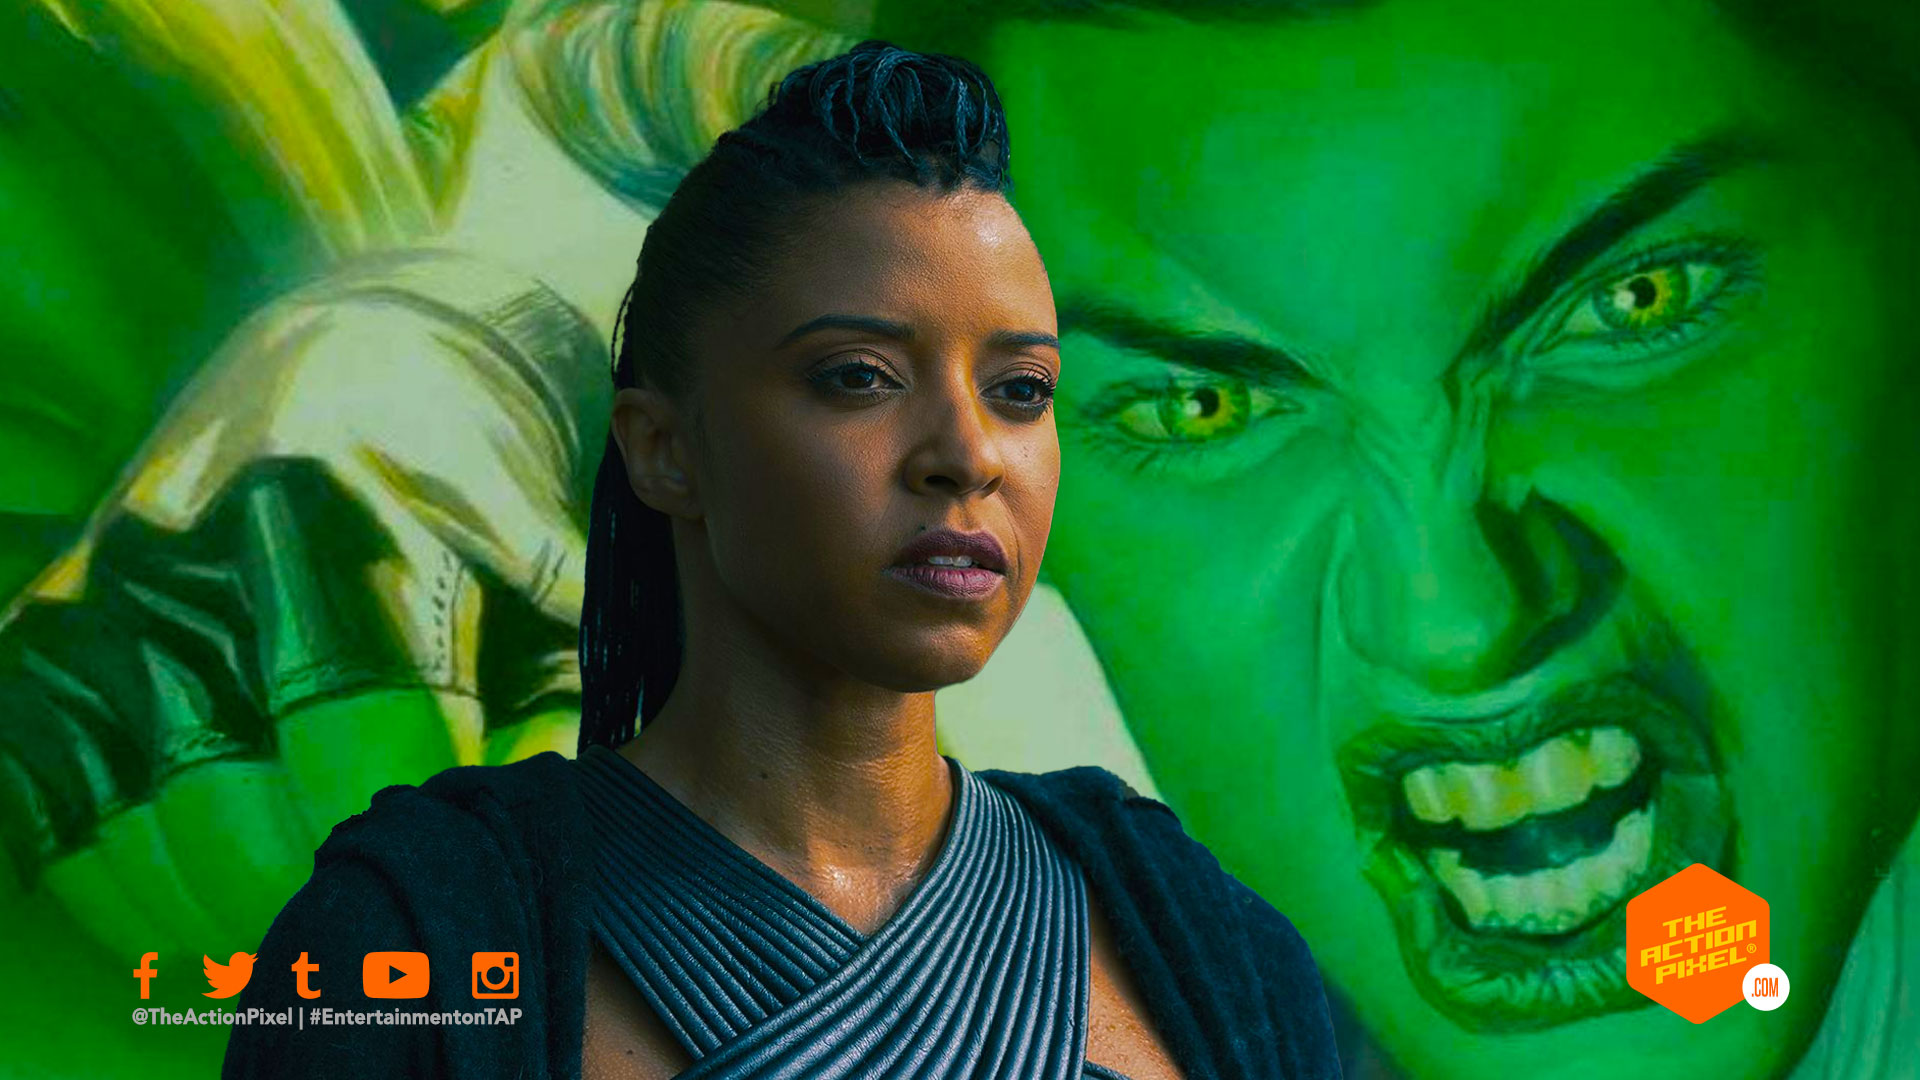 Renée Elise Goldsberry, she-hulk, she hulk, disney plus, disney+ ,disneyplus, marvel studios she-hulk,entertainment on tap, the action pixel,